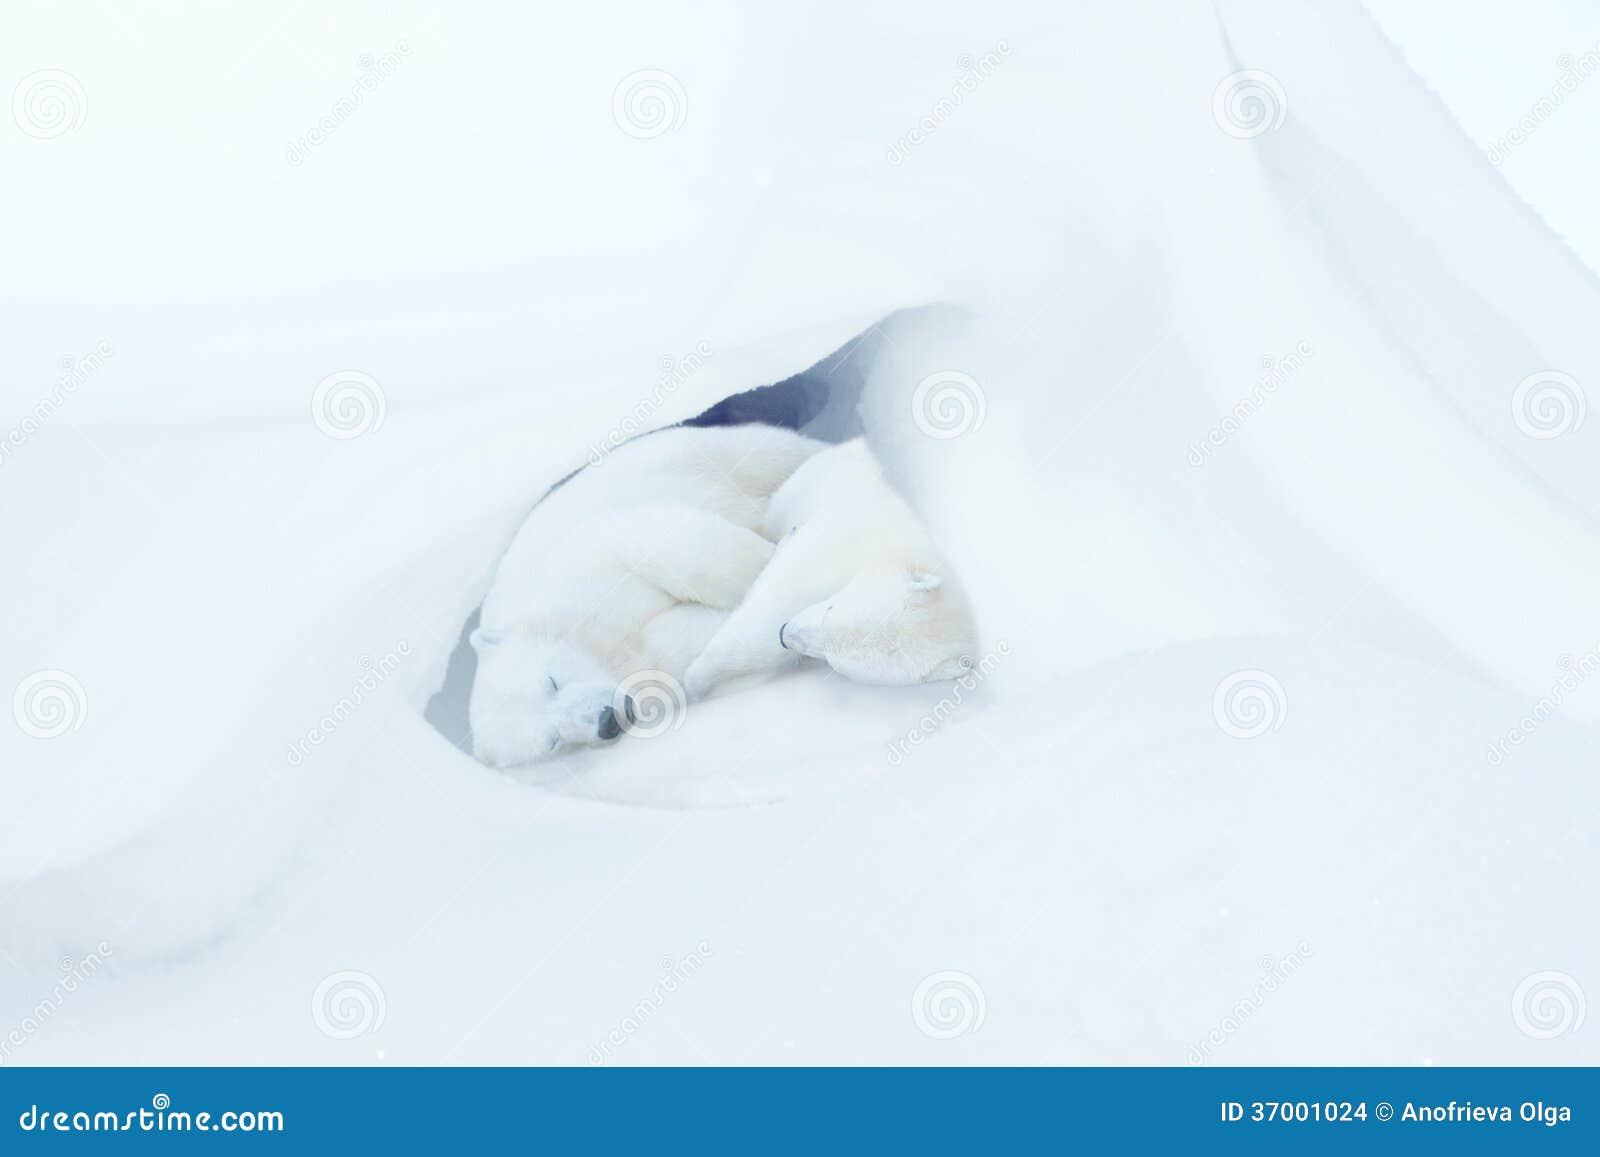 Two sleeping white bear cubs